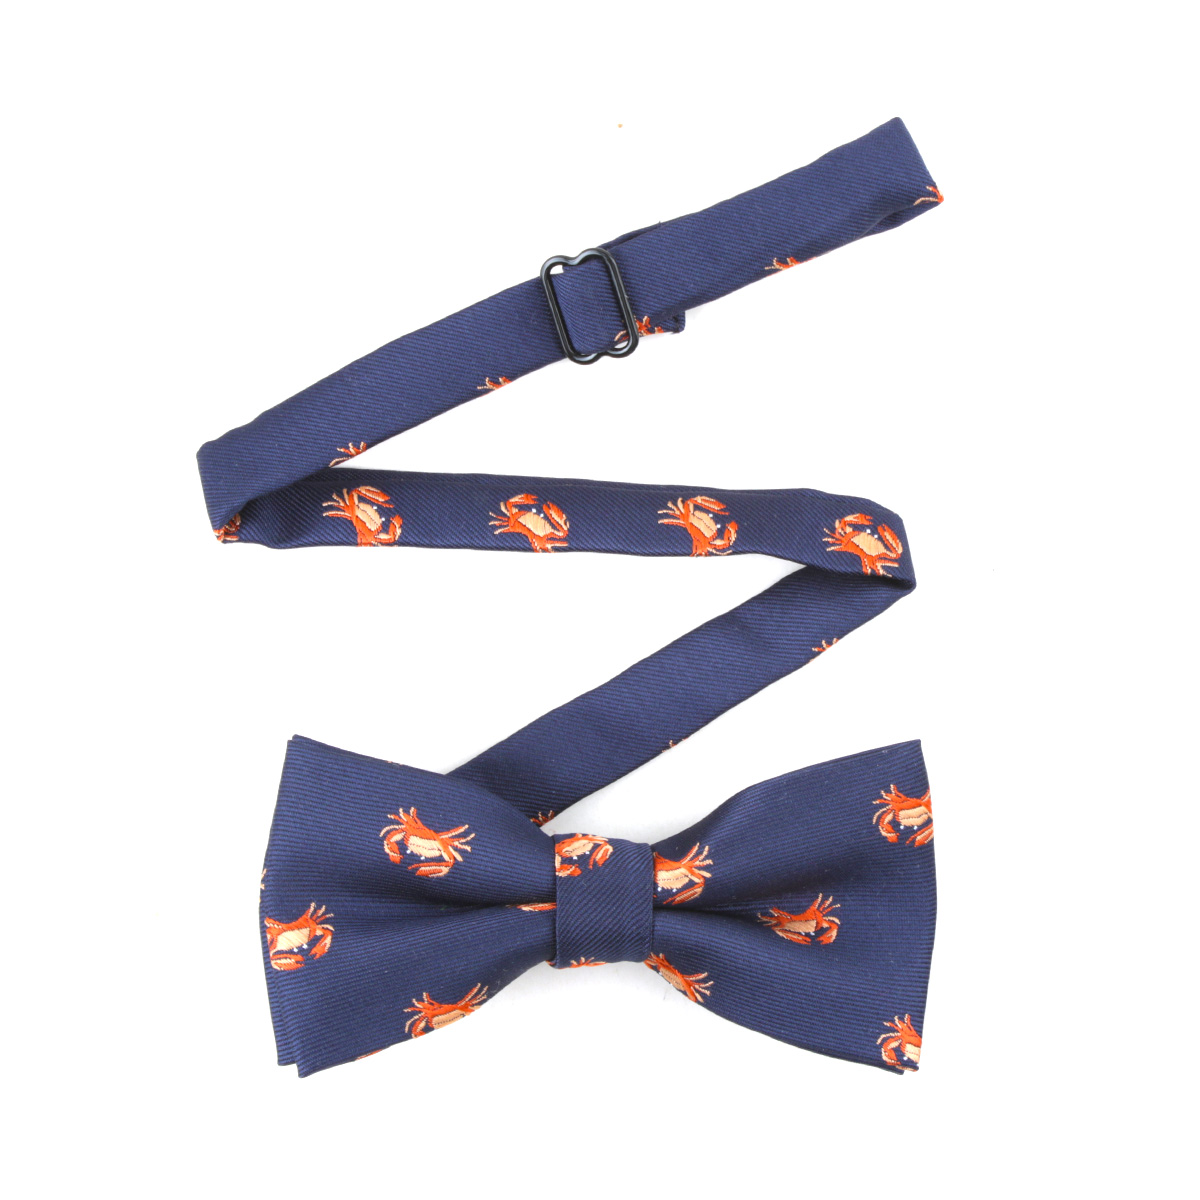 Polyester Bowtie  Cute Crab Pattern  Necktie Boy Men's Fashion Business Wedding Bow Tie Male Dress